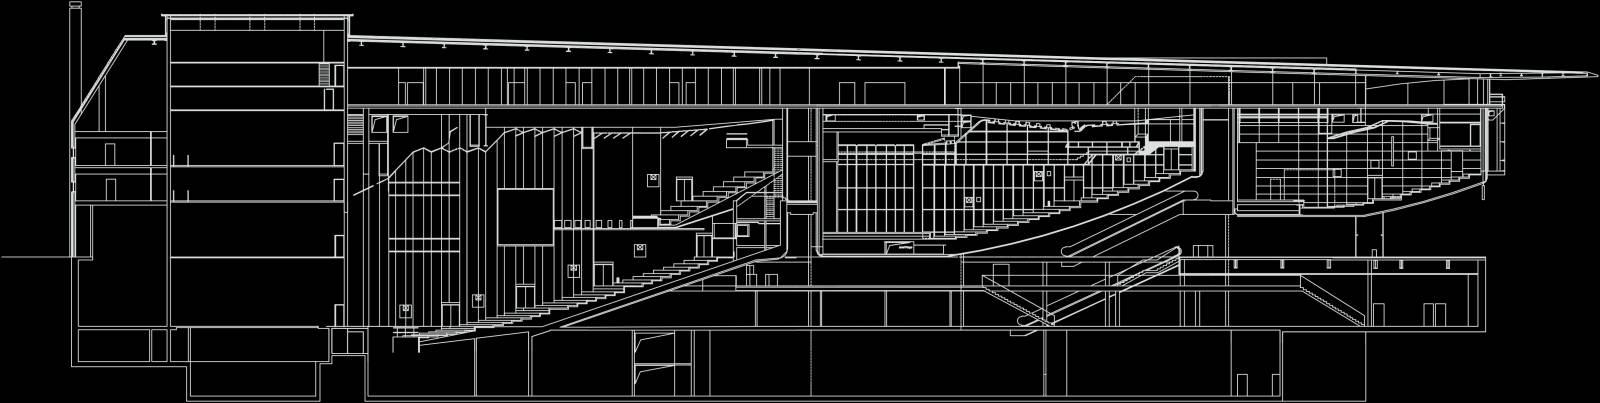 Vinci International Congress Center Ateliers Jean Nouvel